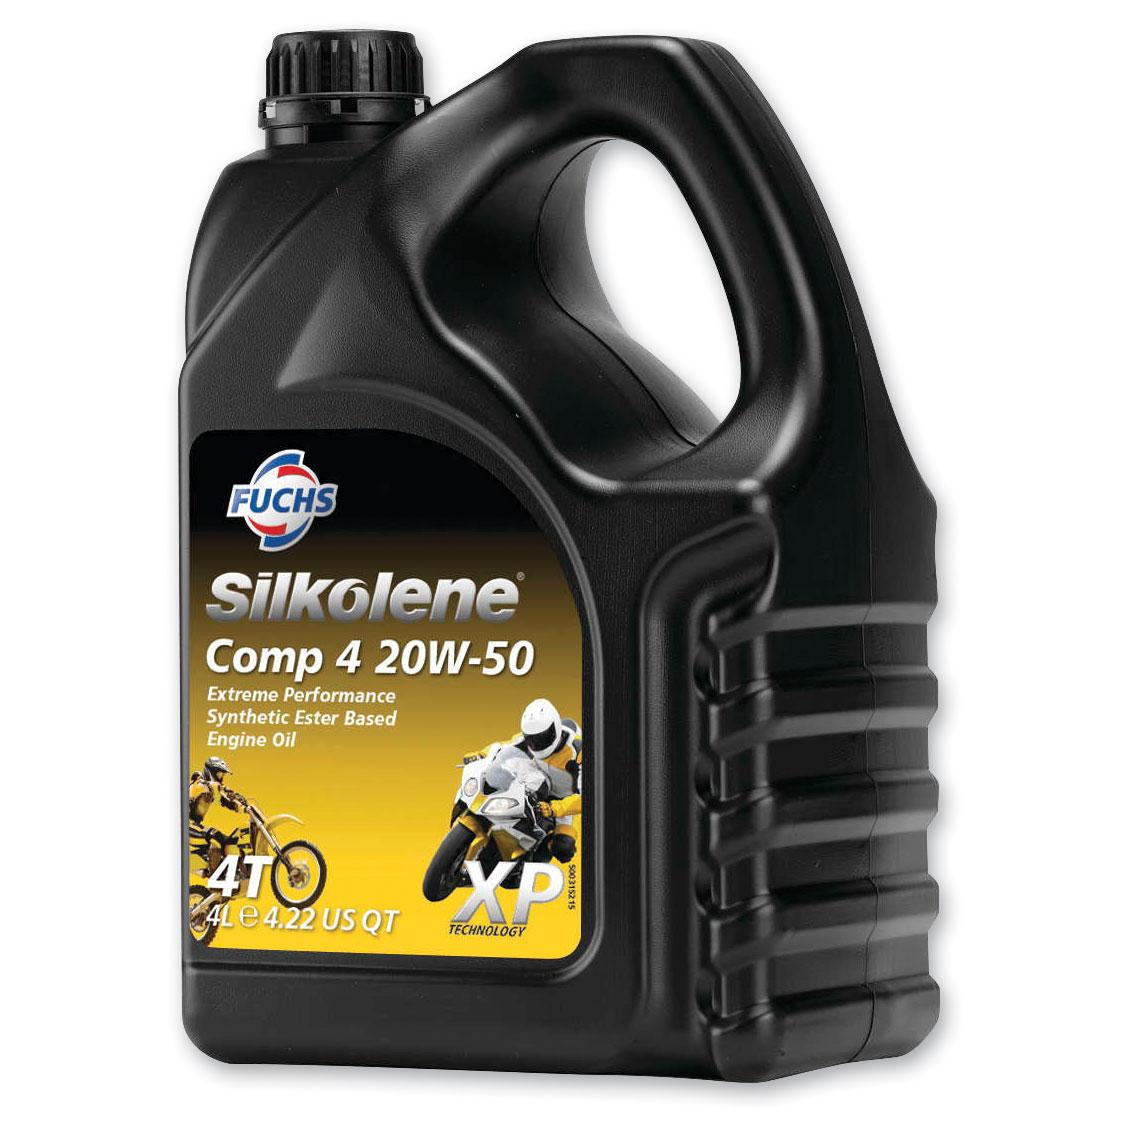 Silkolene Comp 4 XP Engine Oil